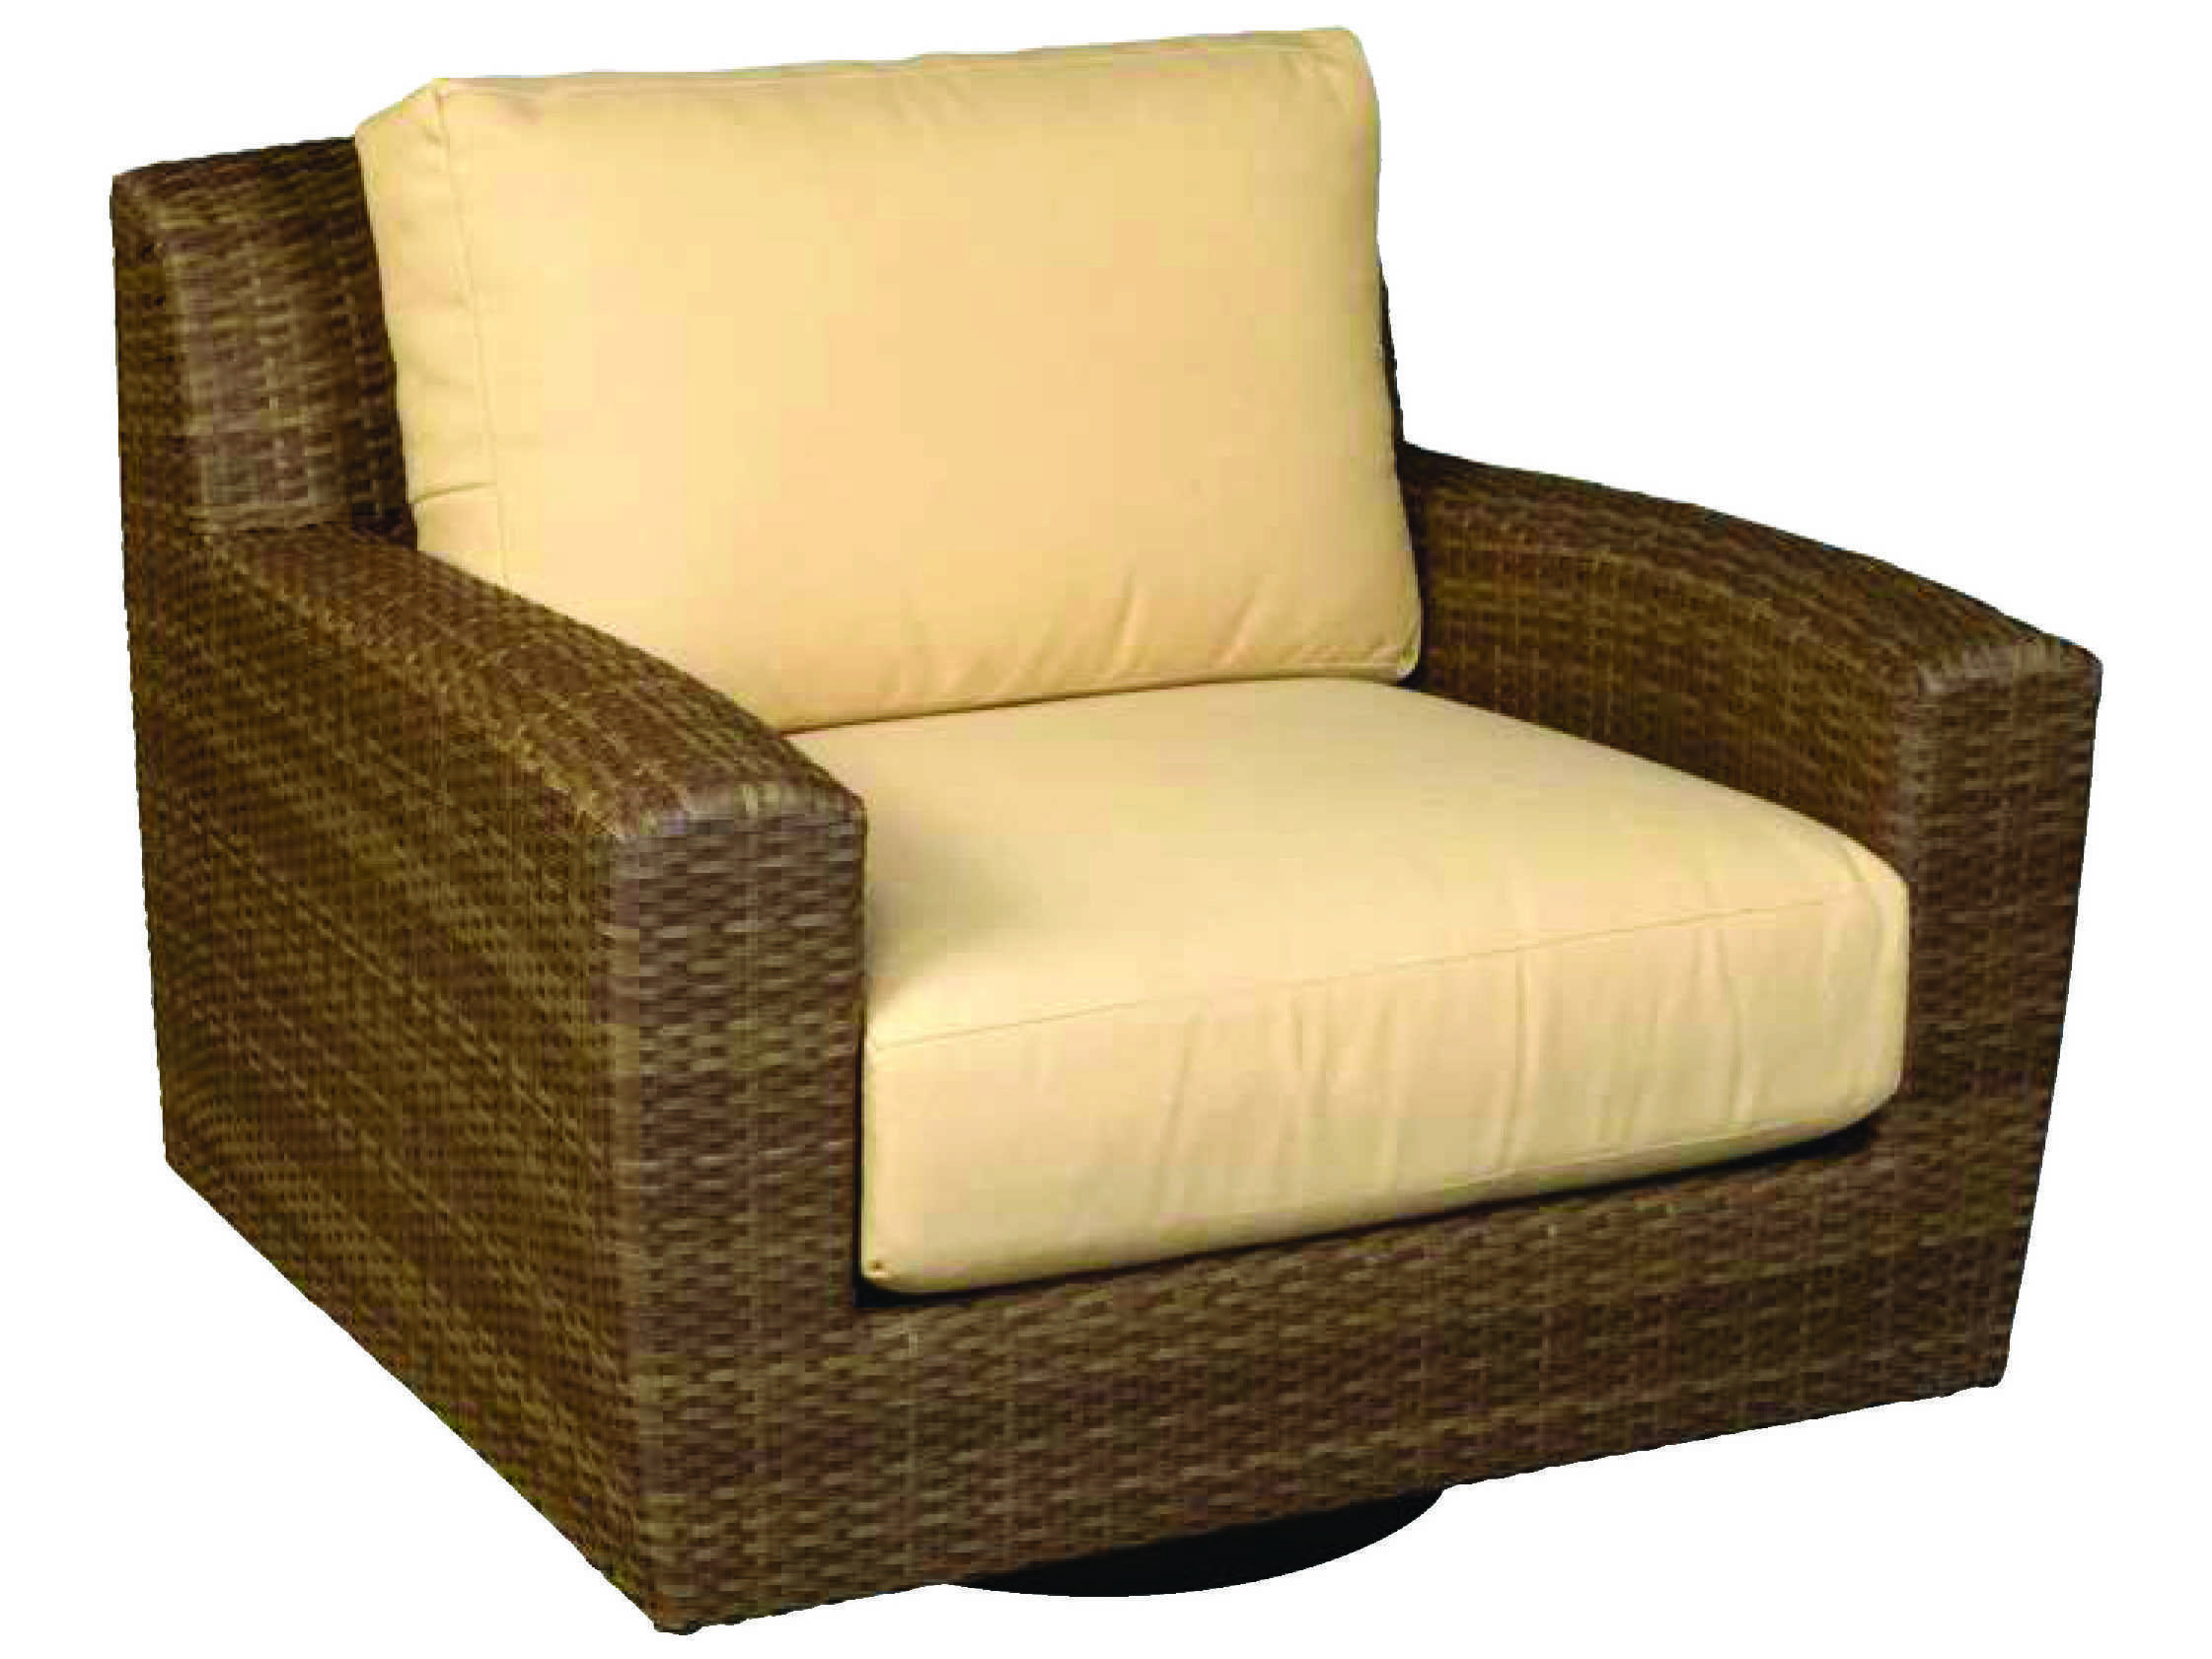 whitecraft saddleback wicker swivel lounge chair s523015